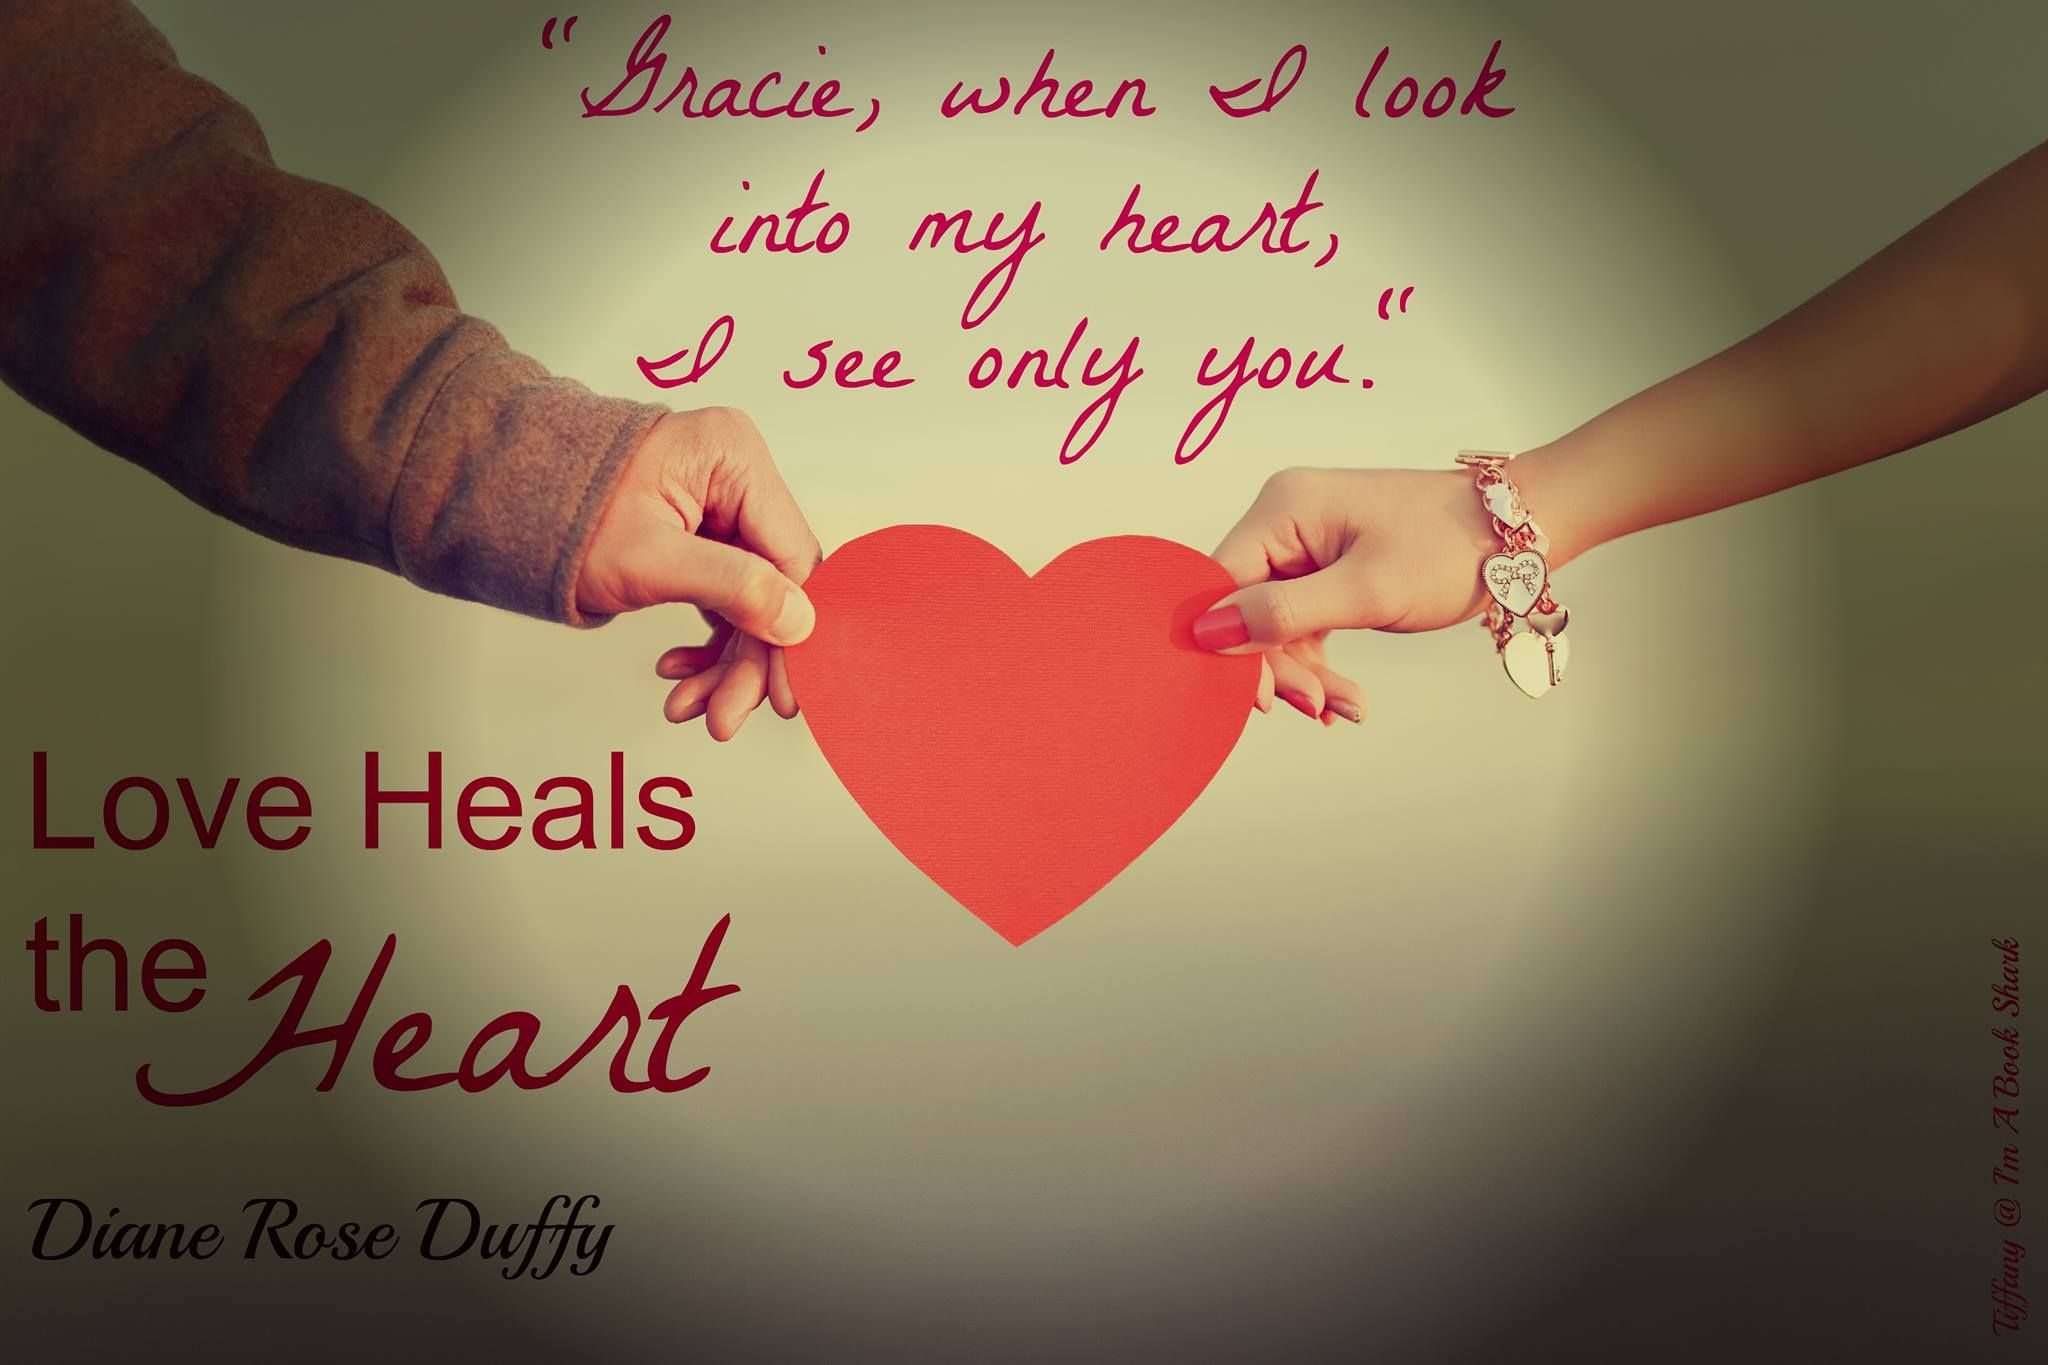 Love heals the heart purchase link httpamazonlove love heals the heart purchase link httpamazon fandeluxe Gallery